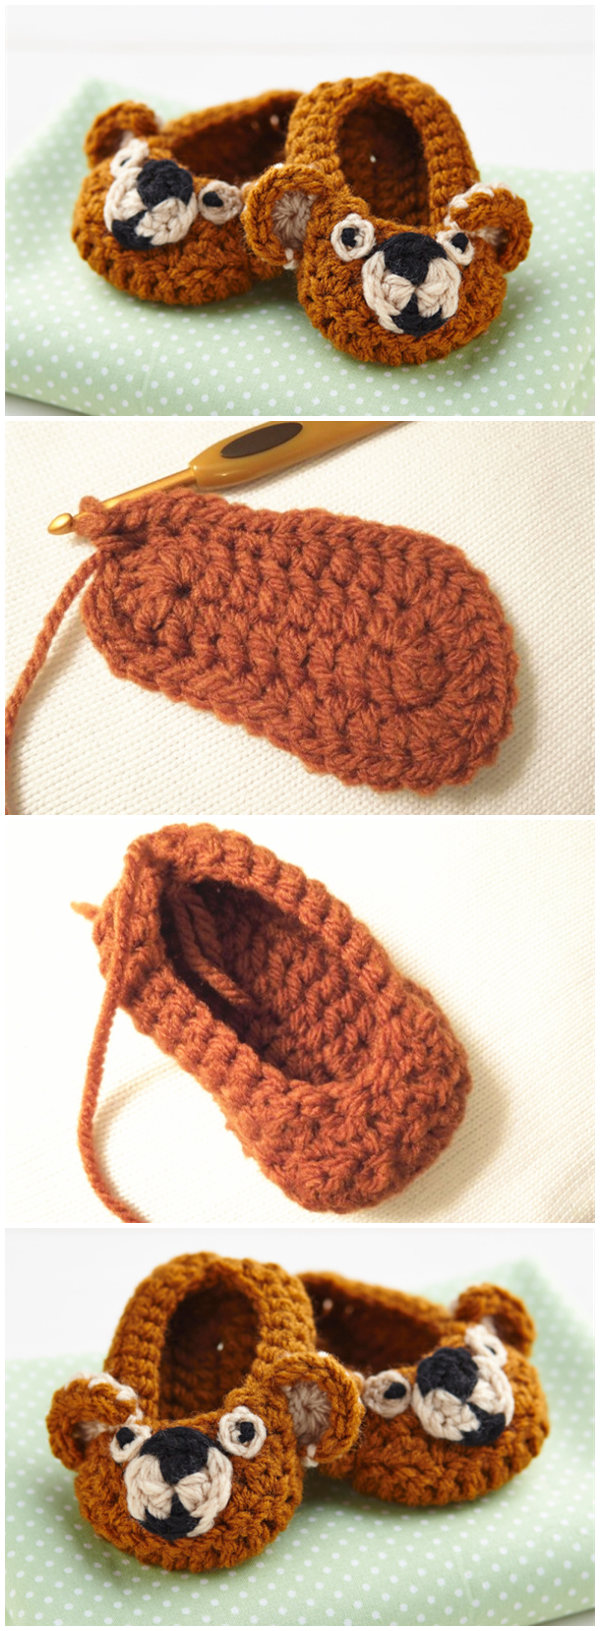 How To Make Crochet Baby Booties